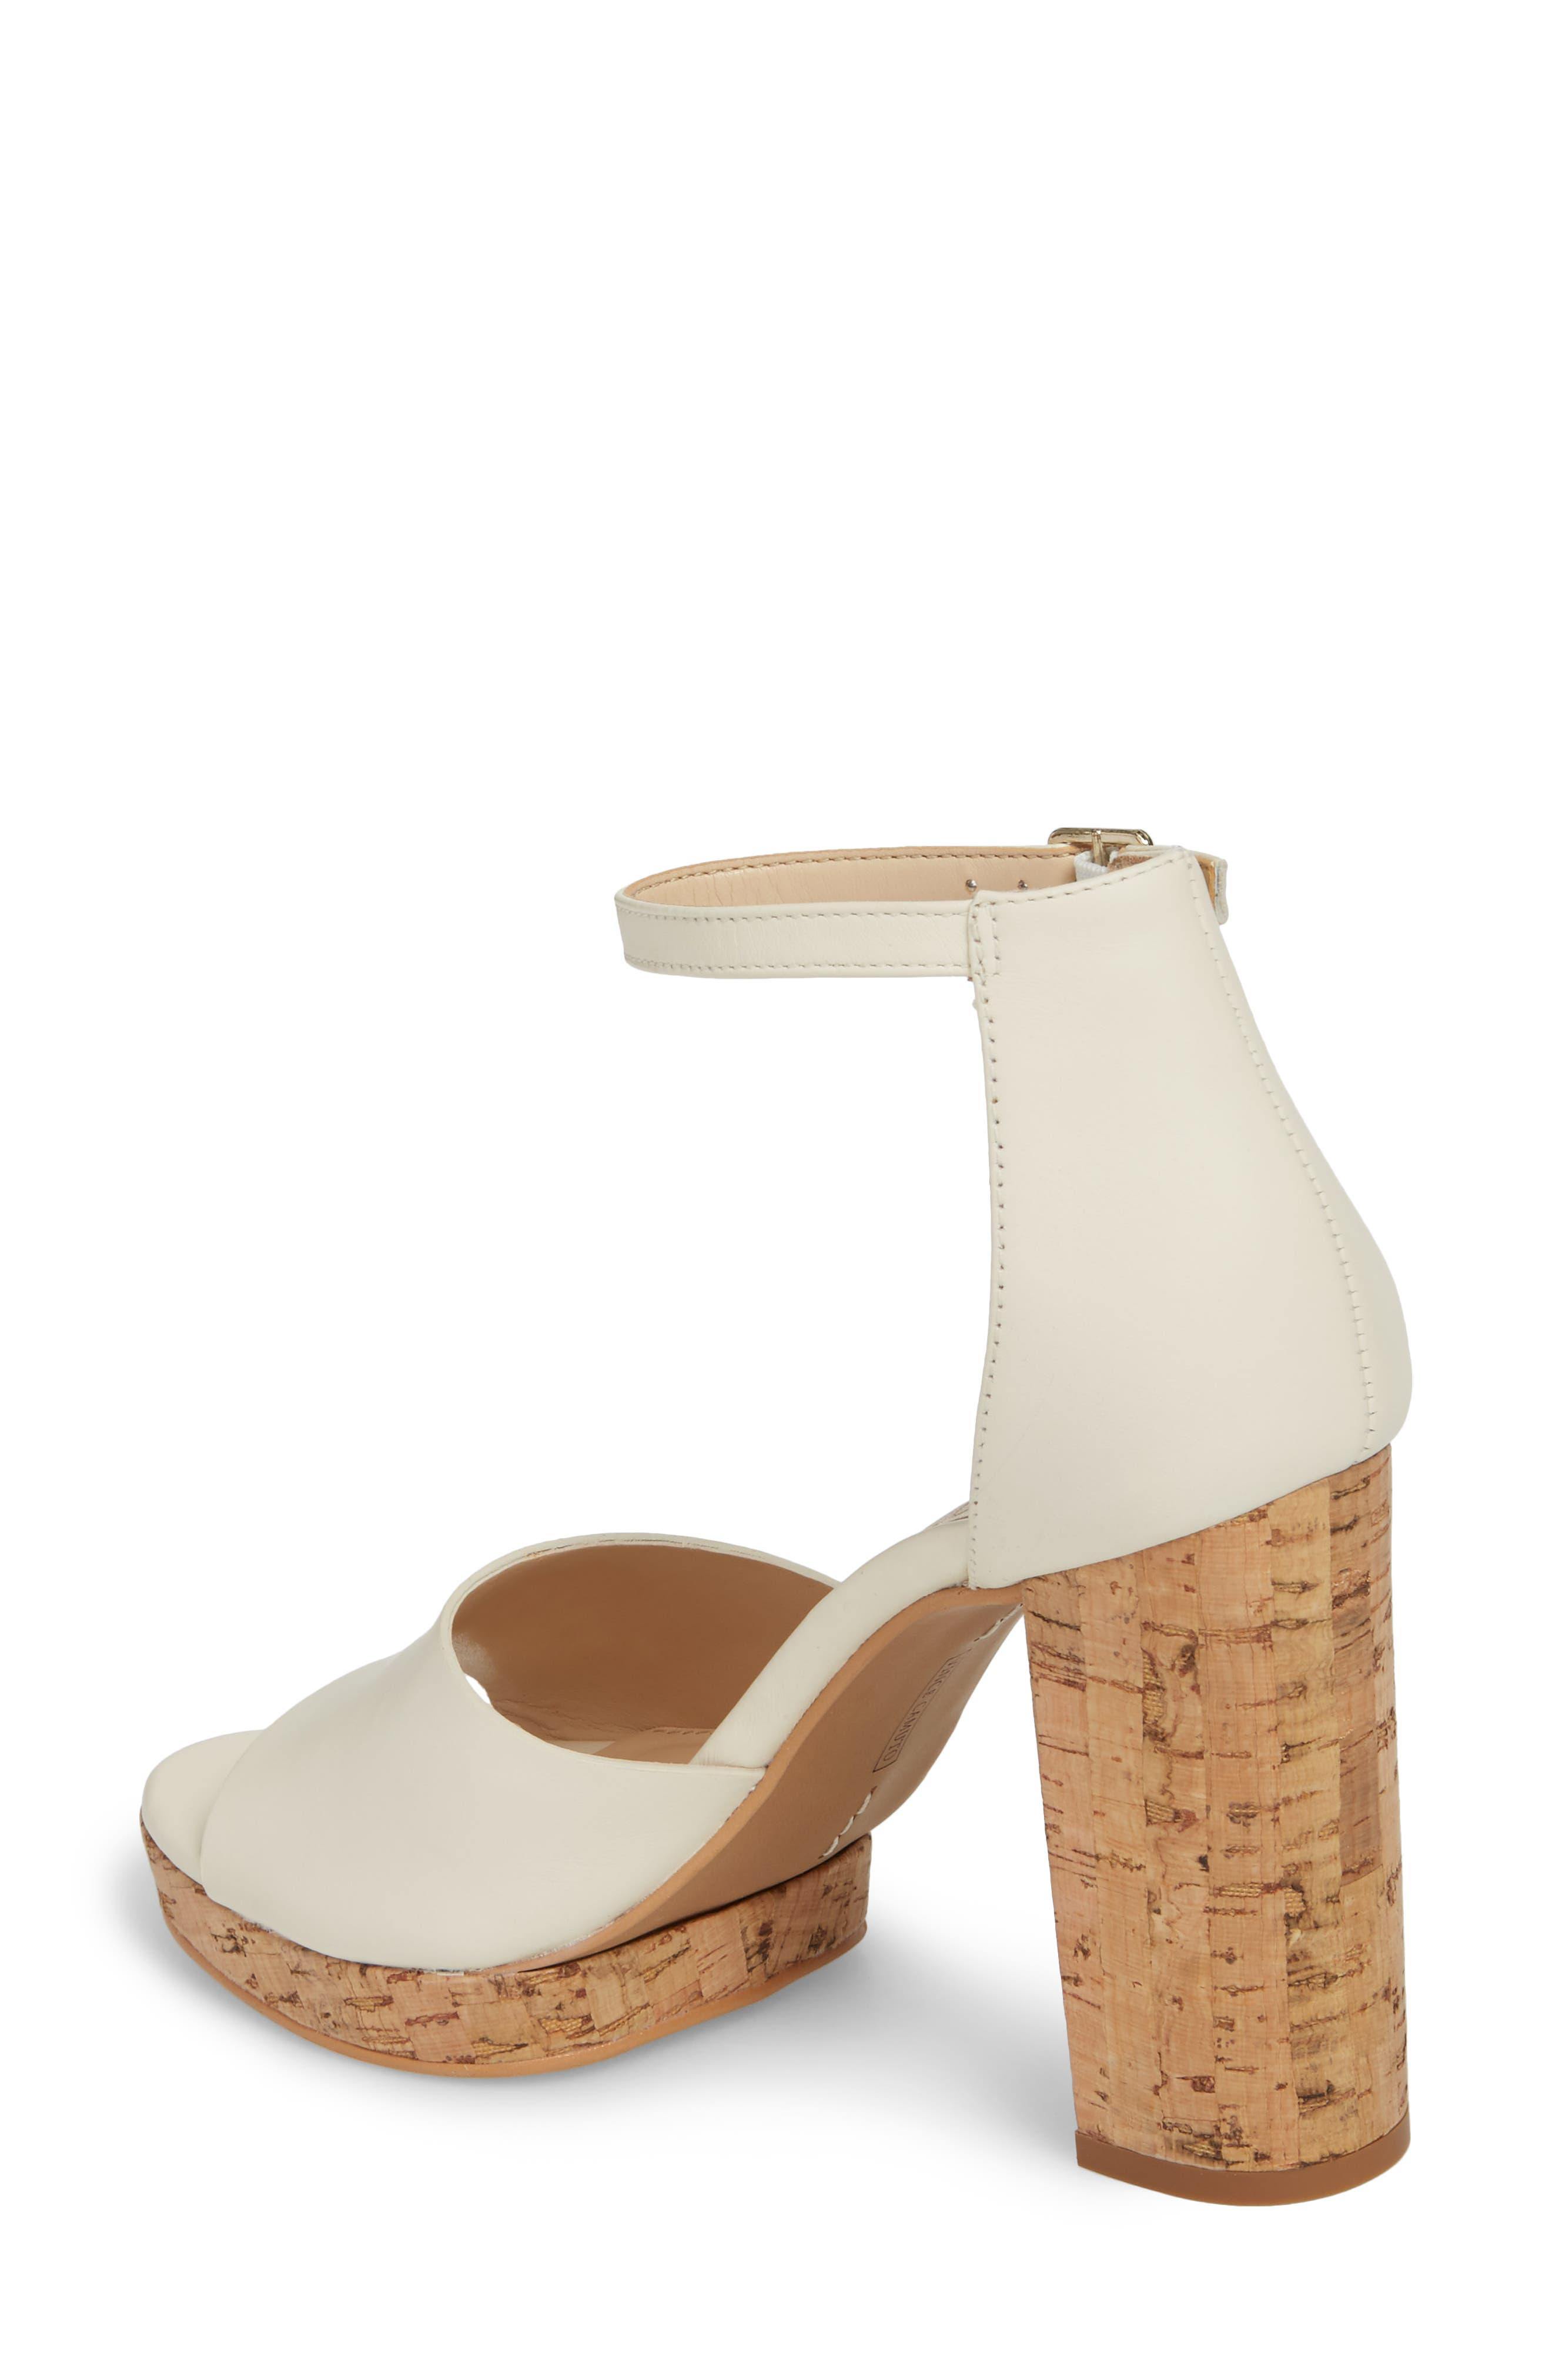 Ciestie Platform Sandal,                             Alternate thumbnail 2, color,                             Vanilla Leather